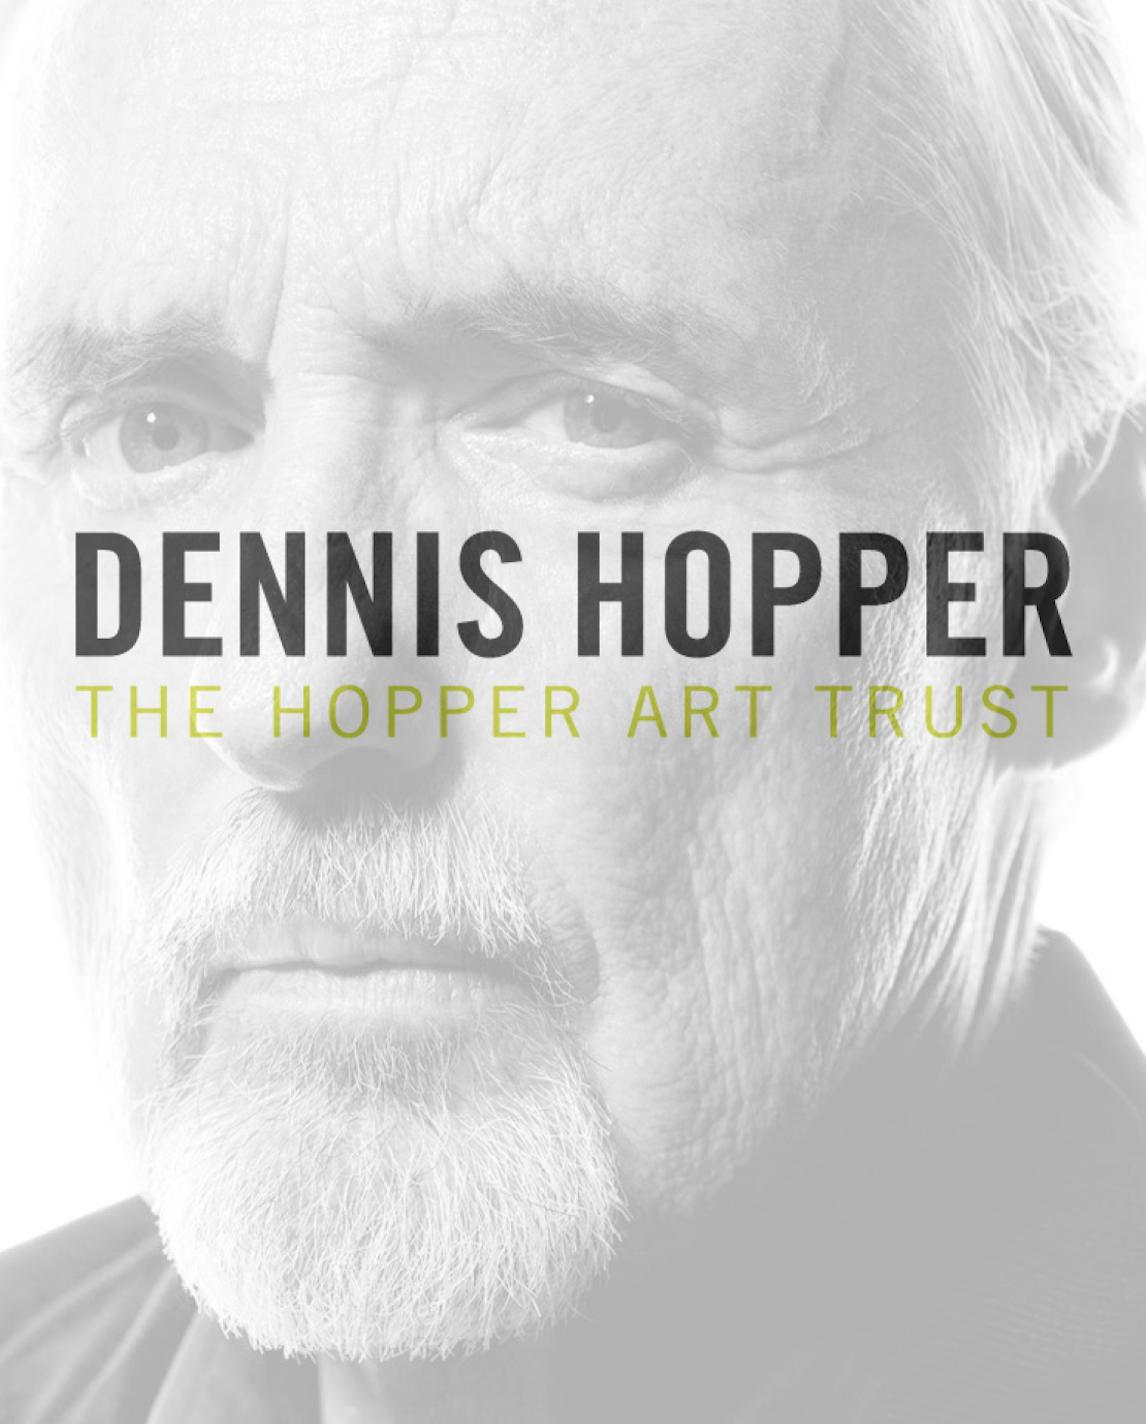 THE HOPPER ART TRUST